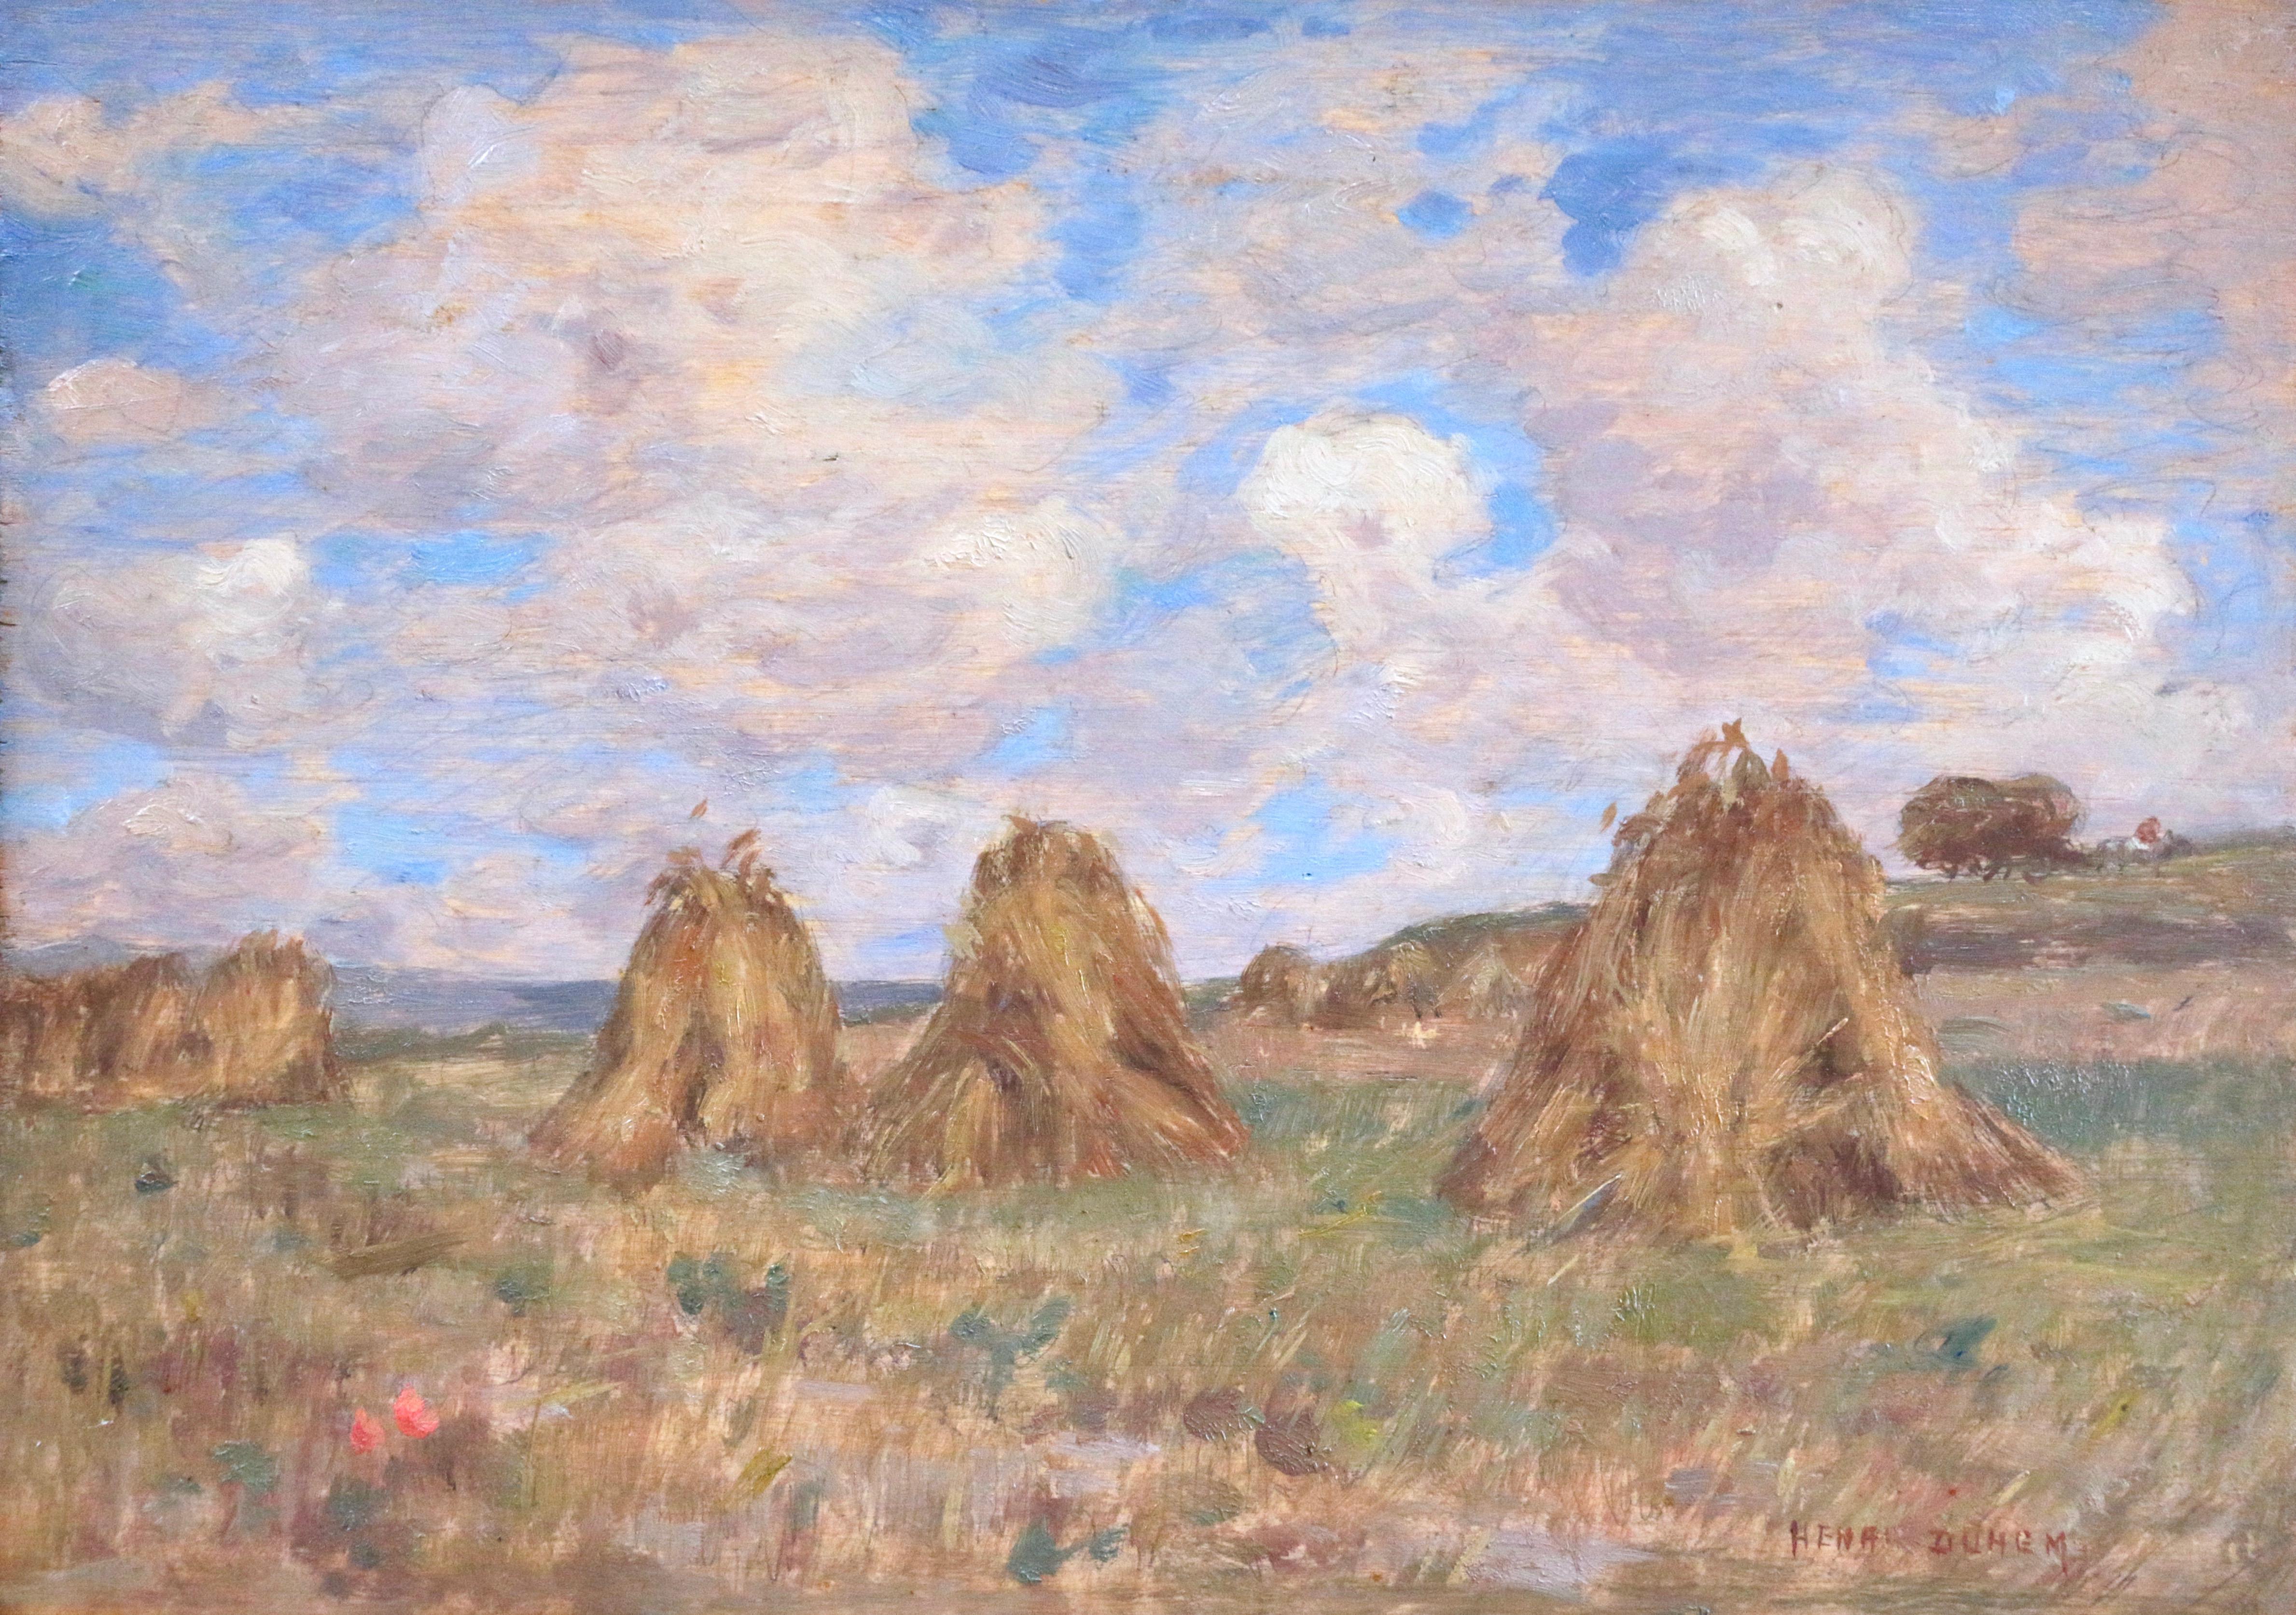 Meules de Foin - 19th Century Oil, Haystacks in French Landscape by Henri Duhem